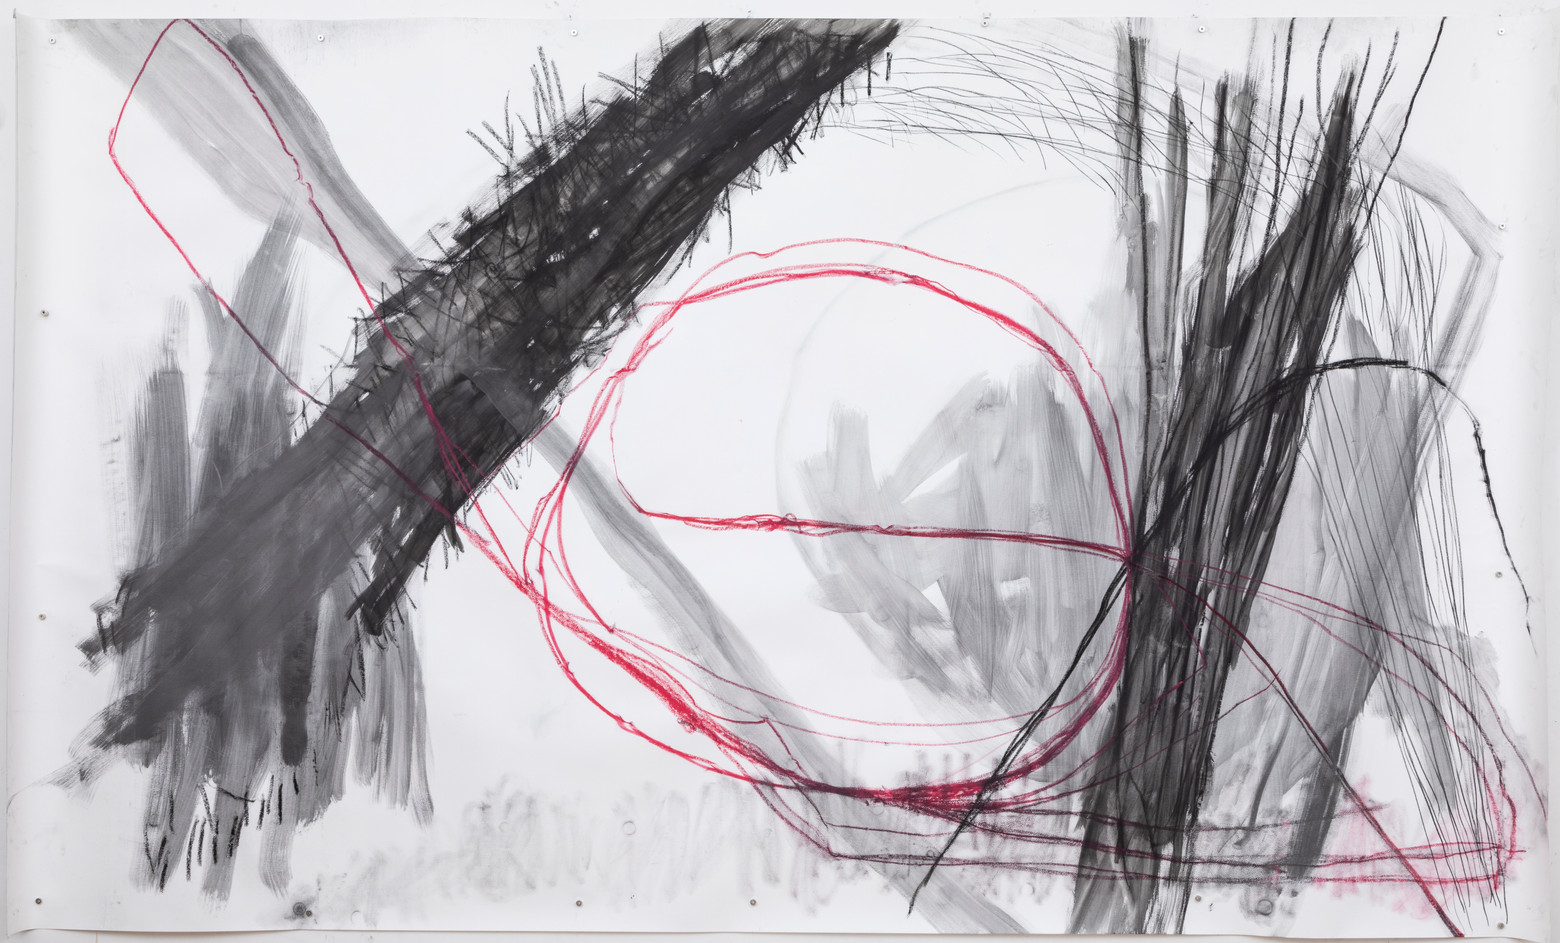 154 x 260 cm grafite e giz pastel oleoso sobre papel foto: Ruy Teixeira